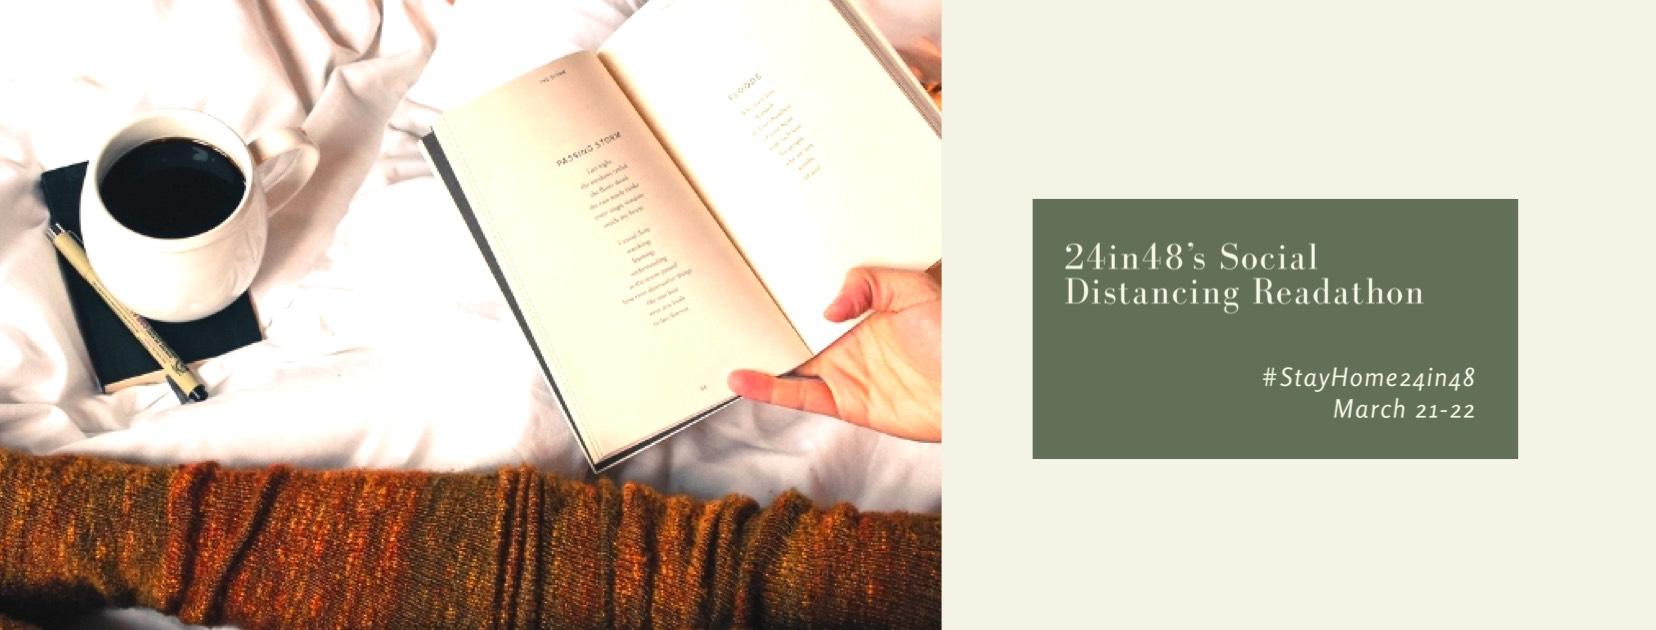 24in48 Readathon: Social Distancing Edition